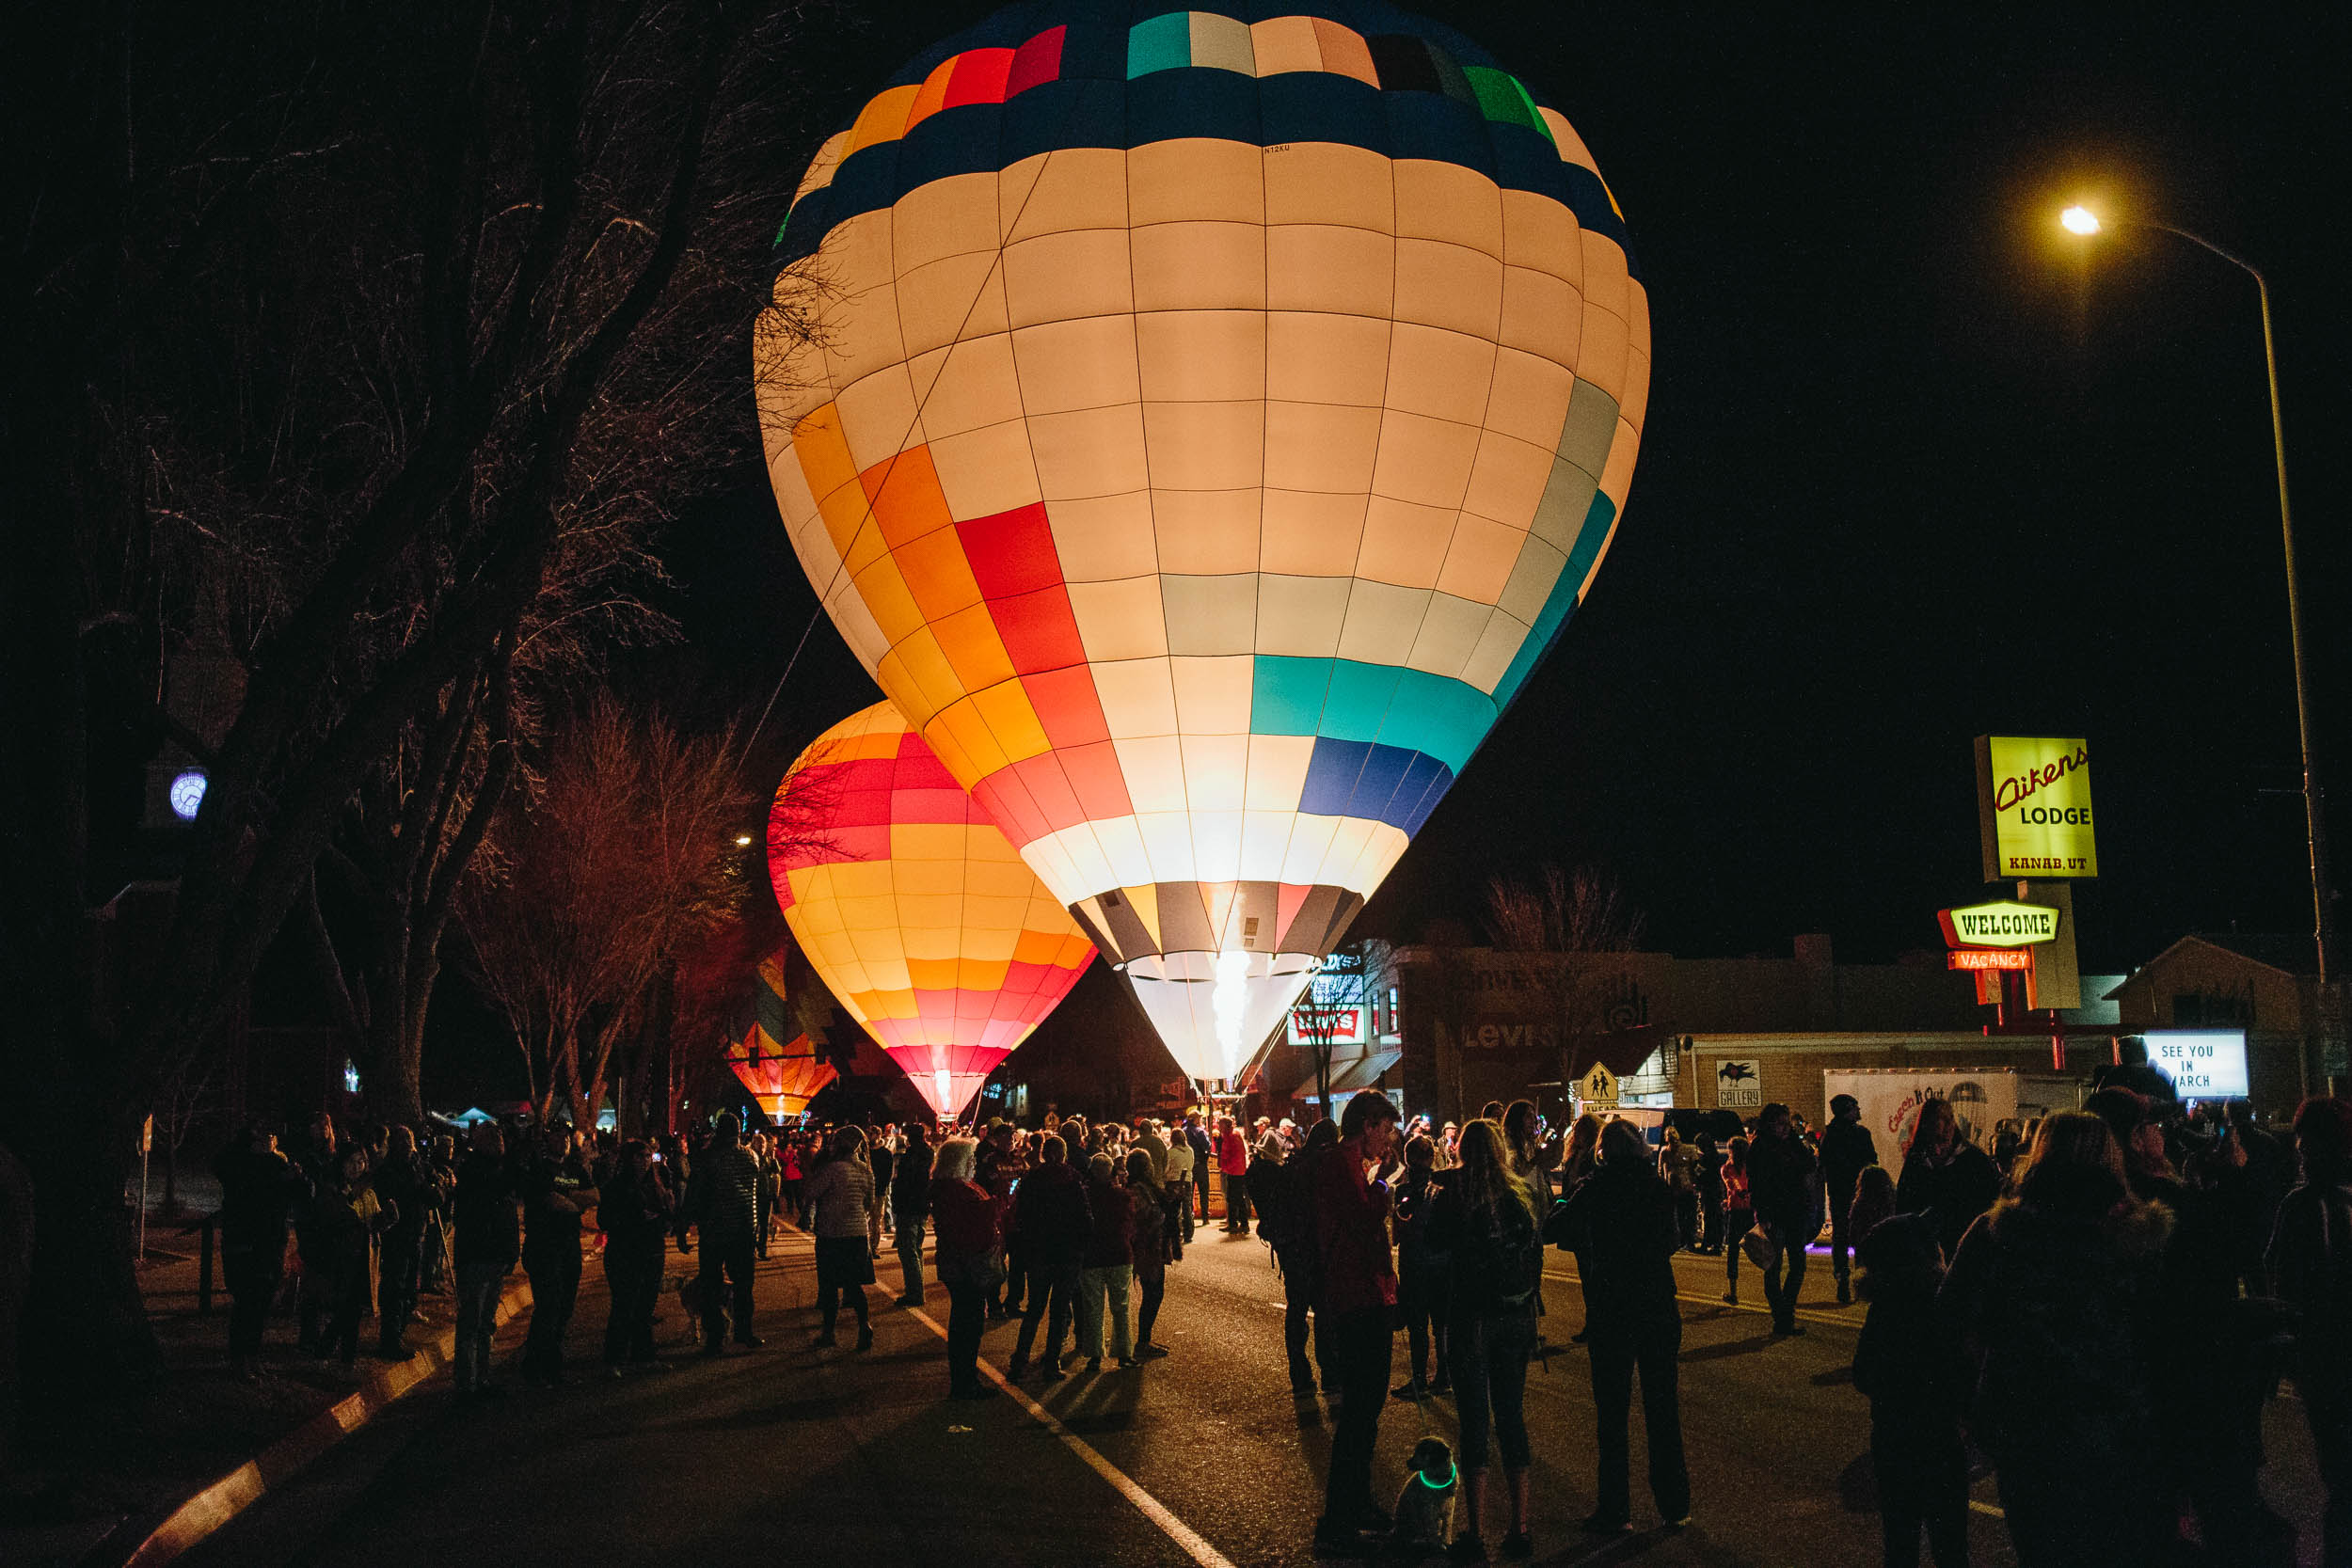 Kyle-Sheppard-Kanab-Balloon-Festival-49.jpg